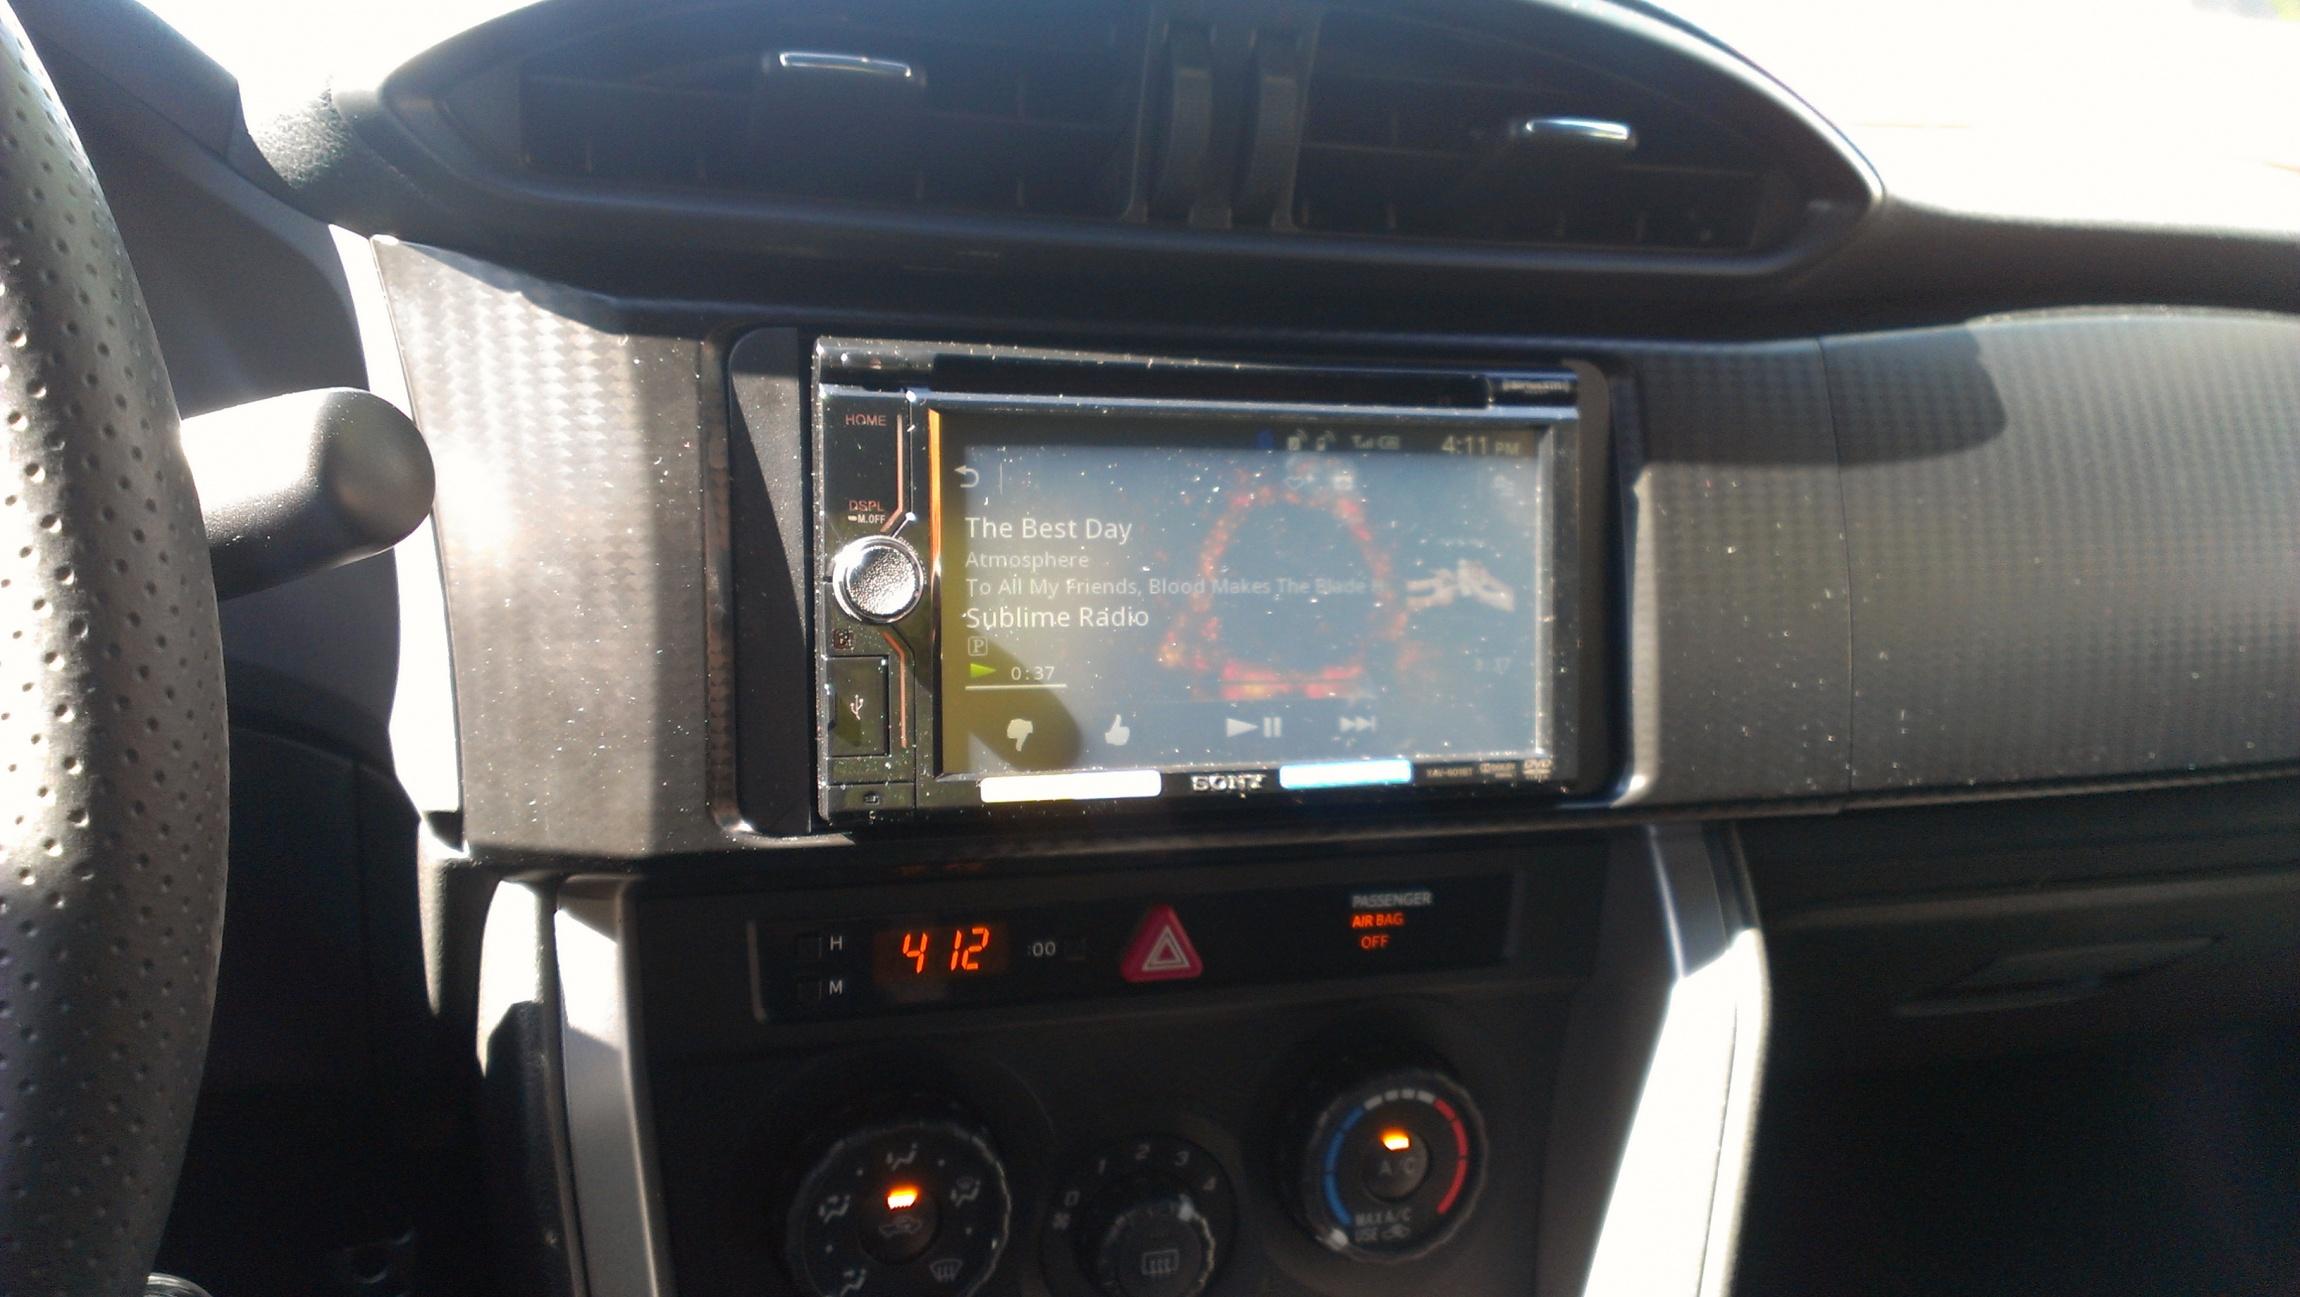 Sony MirrorLink (XAV601BT) - Page 2 - Scion FR-S Forum